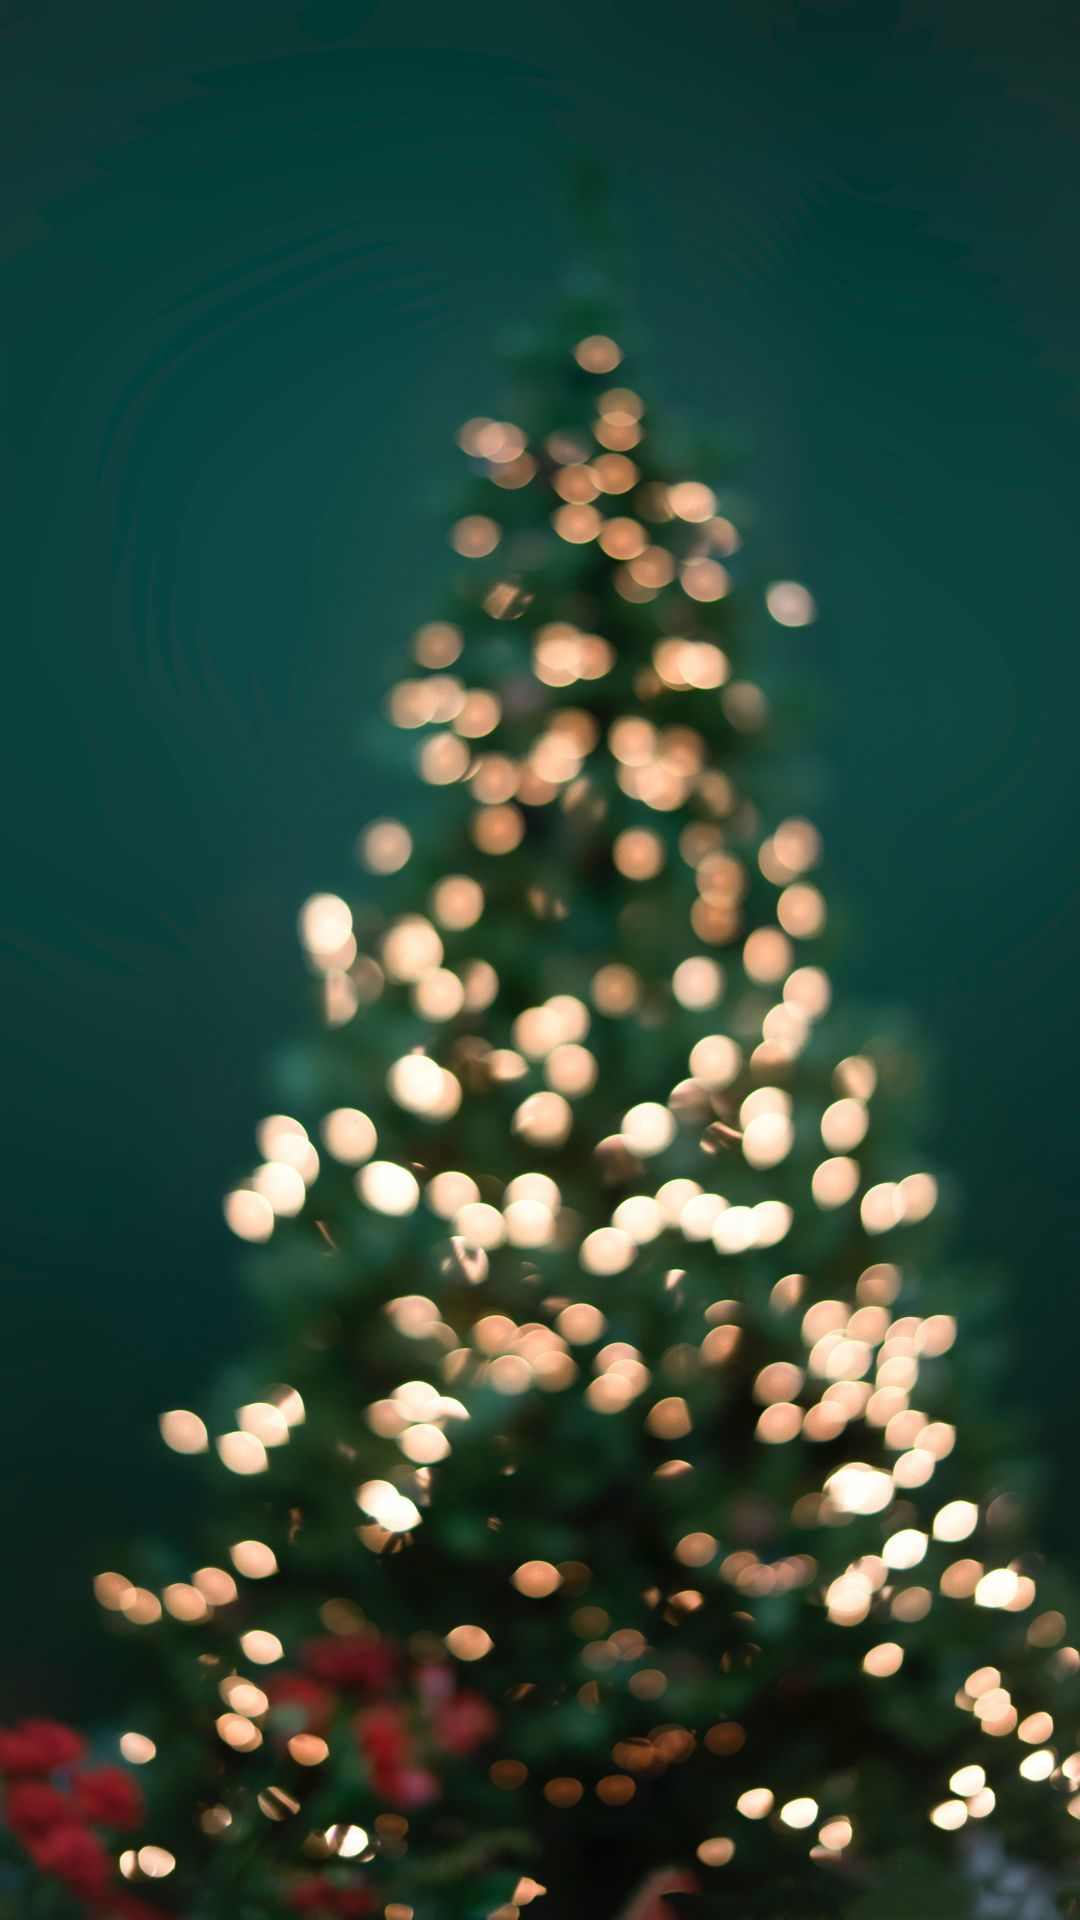 Christmas Lights Iphone Wallpaper , Iphone Xs Max Christmas